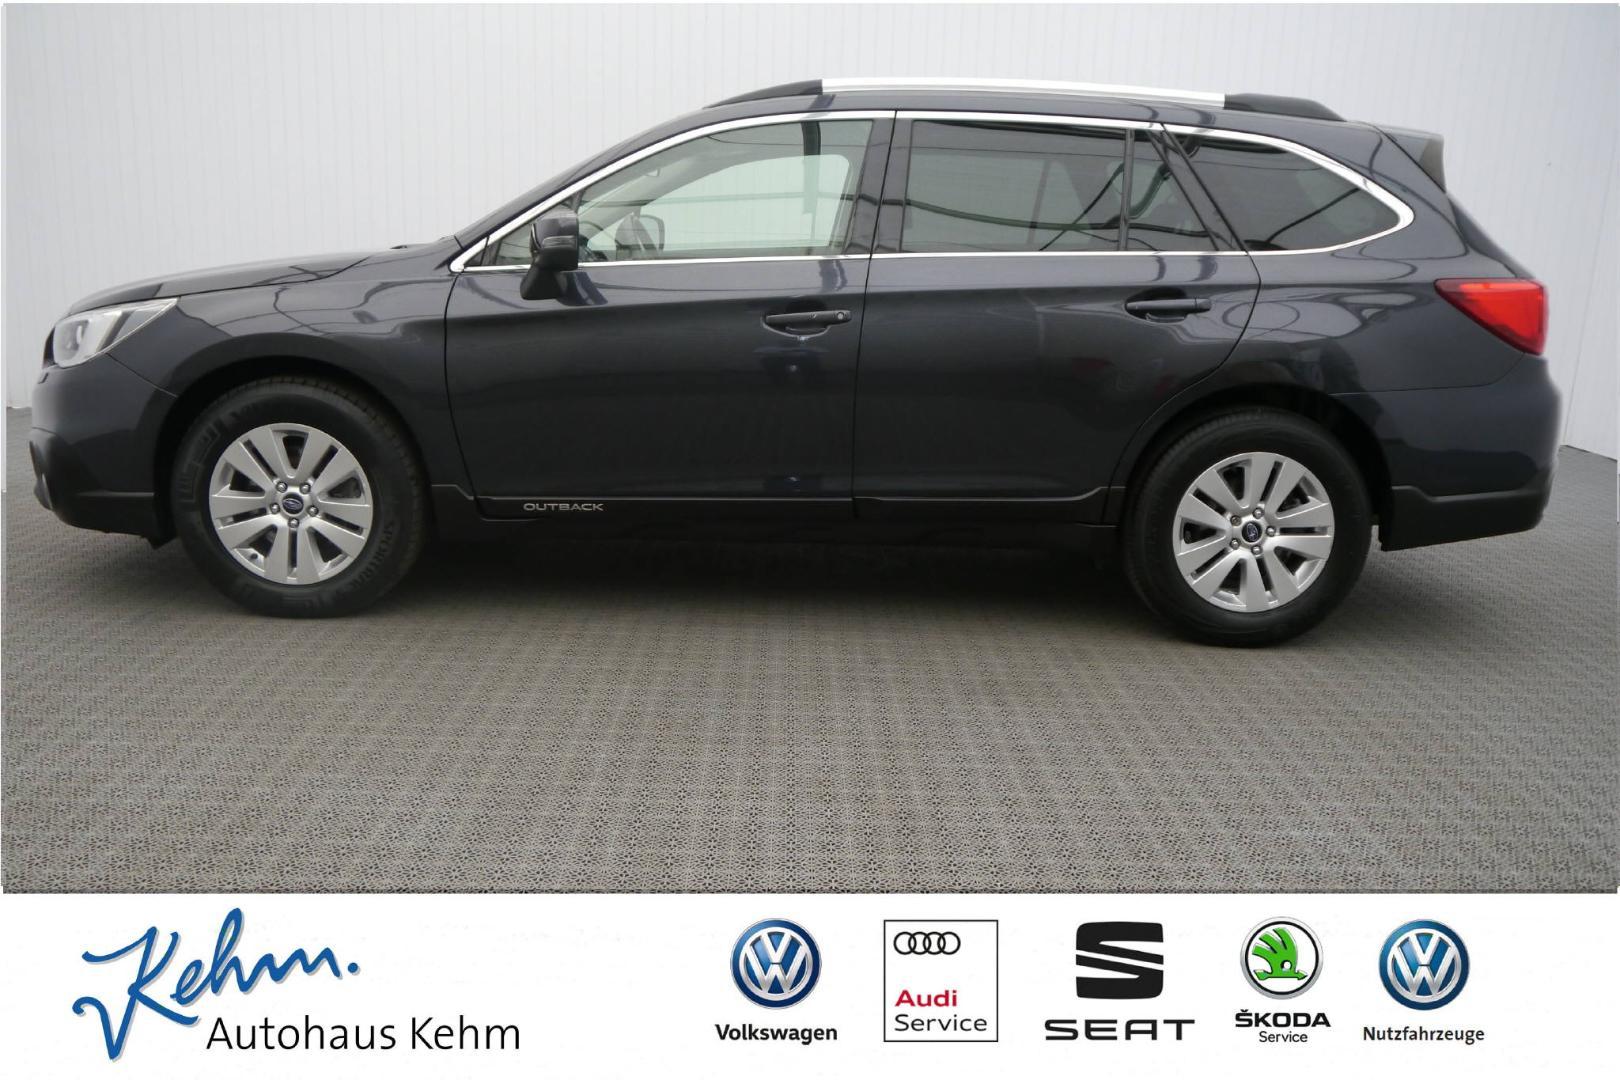 Subaru Outback 2 0l D LED+NAVI+AHK+GSD, Jahr 2015, diesel